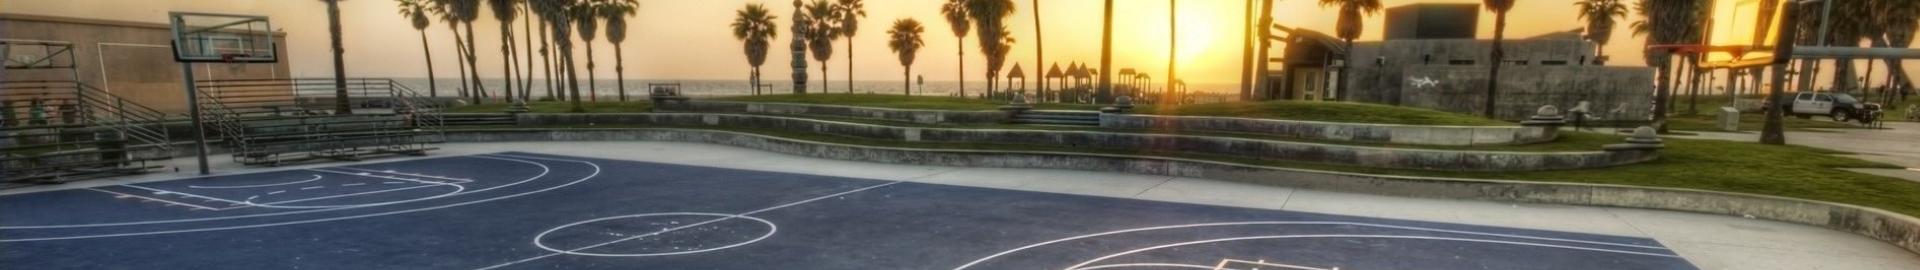 Abbigliamento da Basket Uomo/Donna/Bambino   Basket Zone Siena